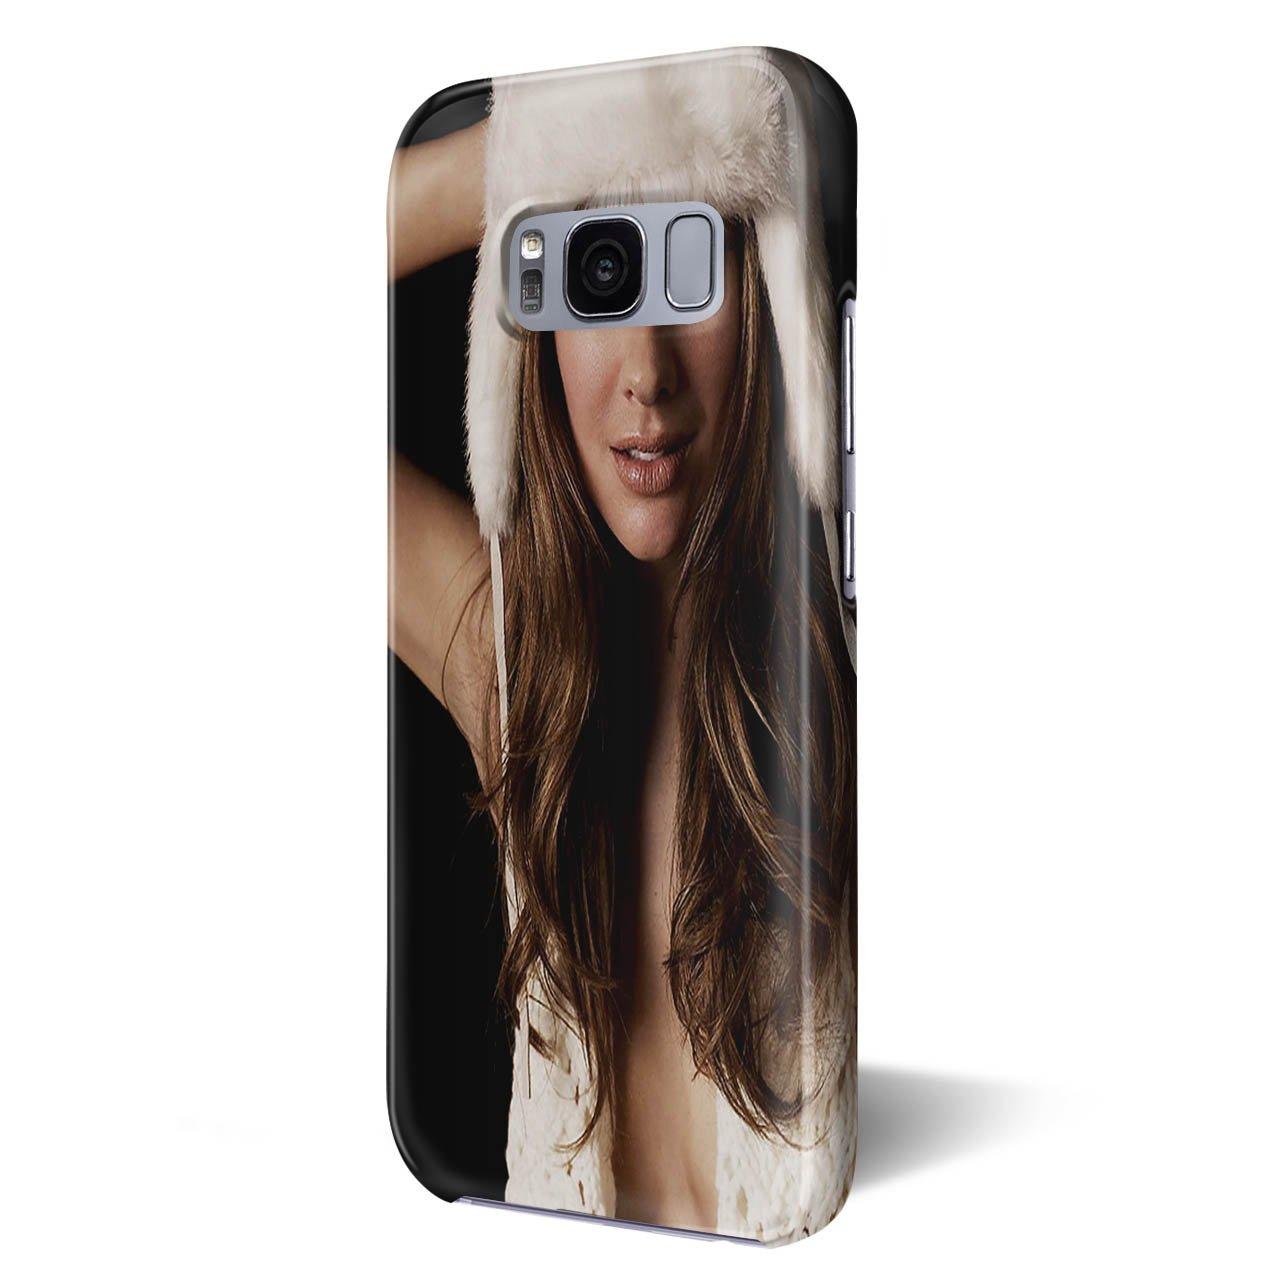 Amazon.com: Model Sexy Fashion Erotic Hot 3D Samsung Galaxy S8 Plus Case |  Wellcoda: Cell Phones & Accessories